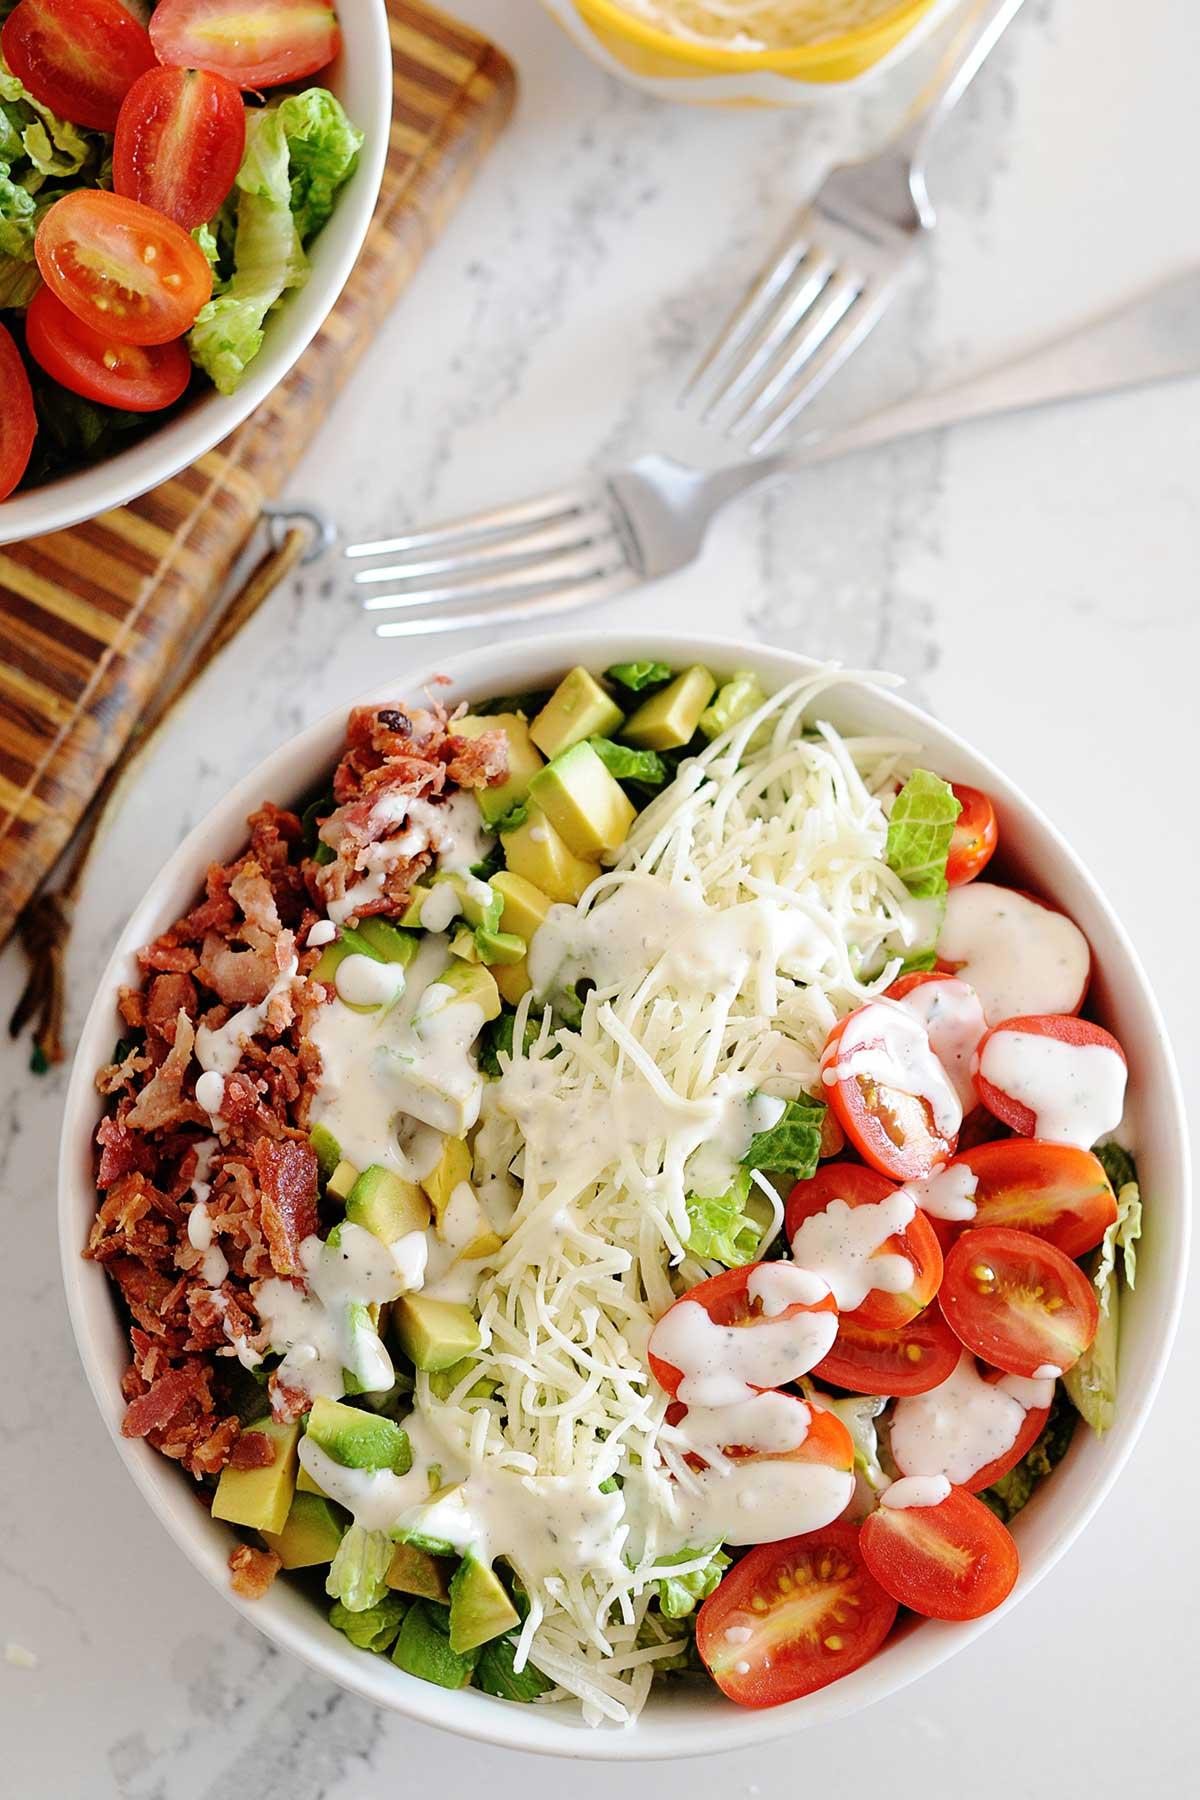 huge blt salad with dressing in a bowl